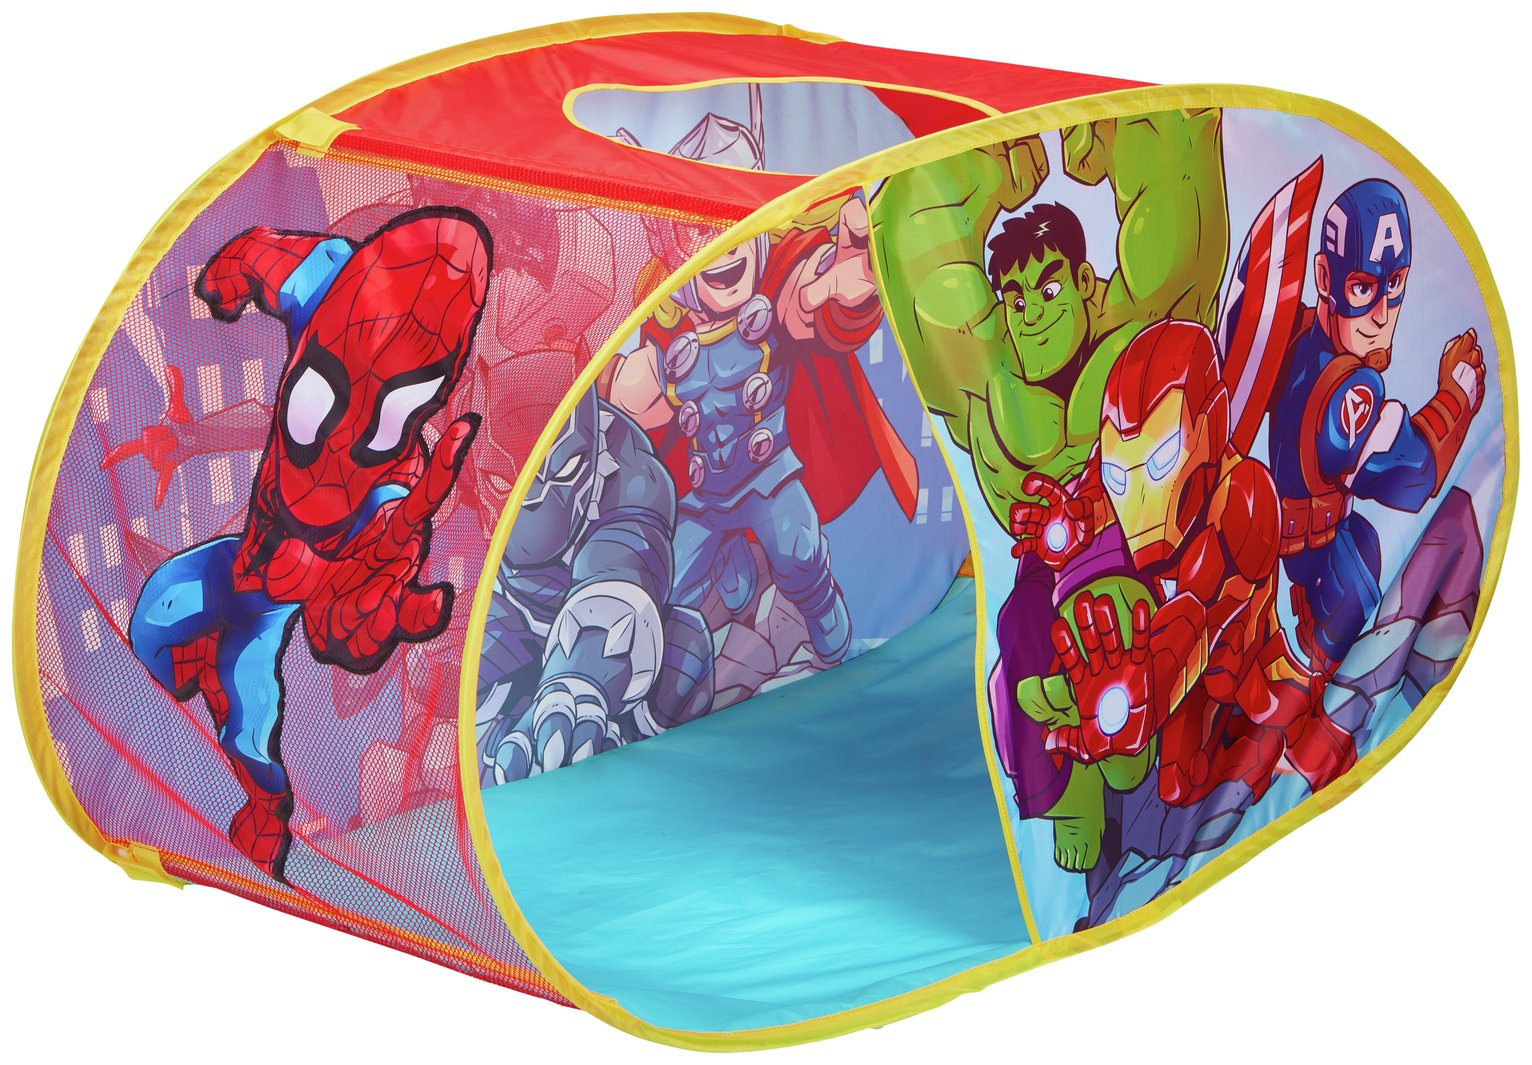 Marvel Superheroes Play Tent